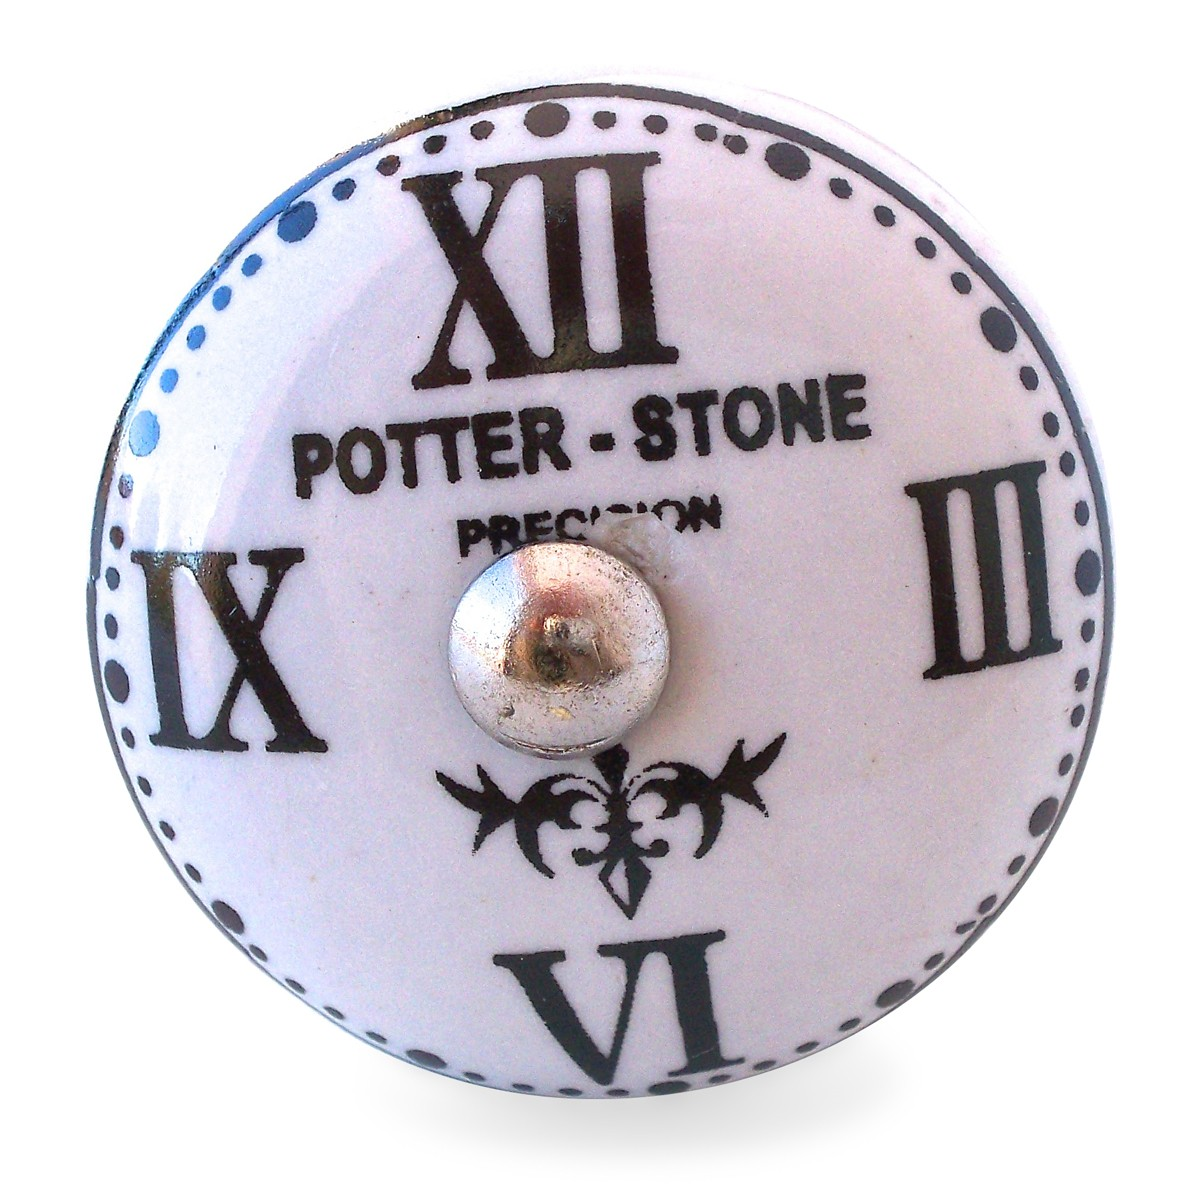 bouton de meuble horloge potter stone industriel. Black Bedroom Furniture Sets. Home Design Ideas